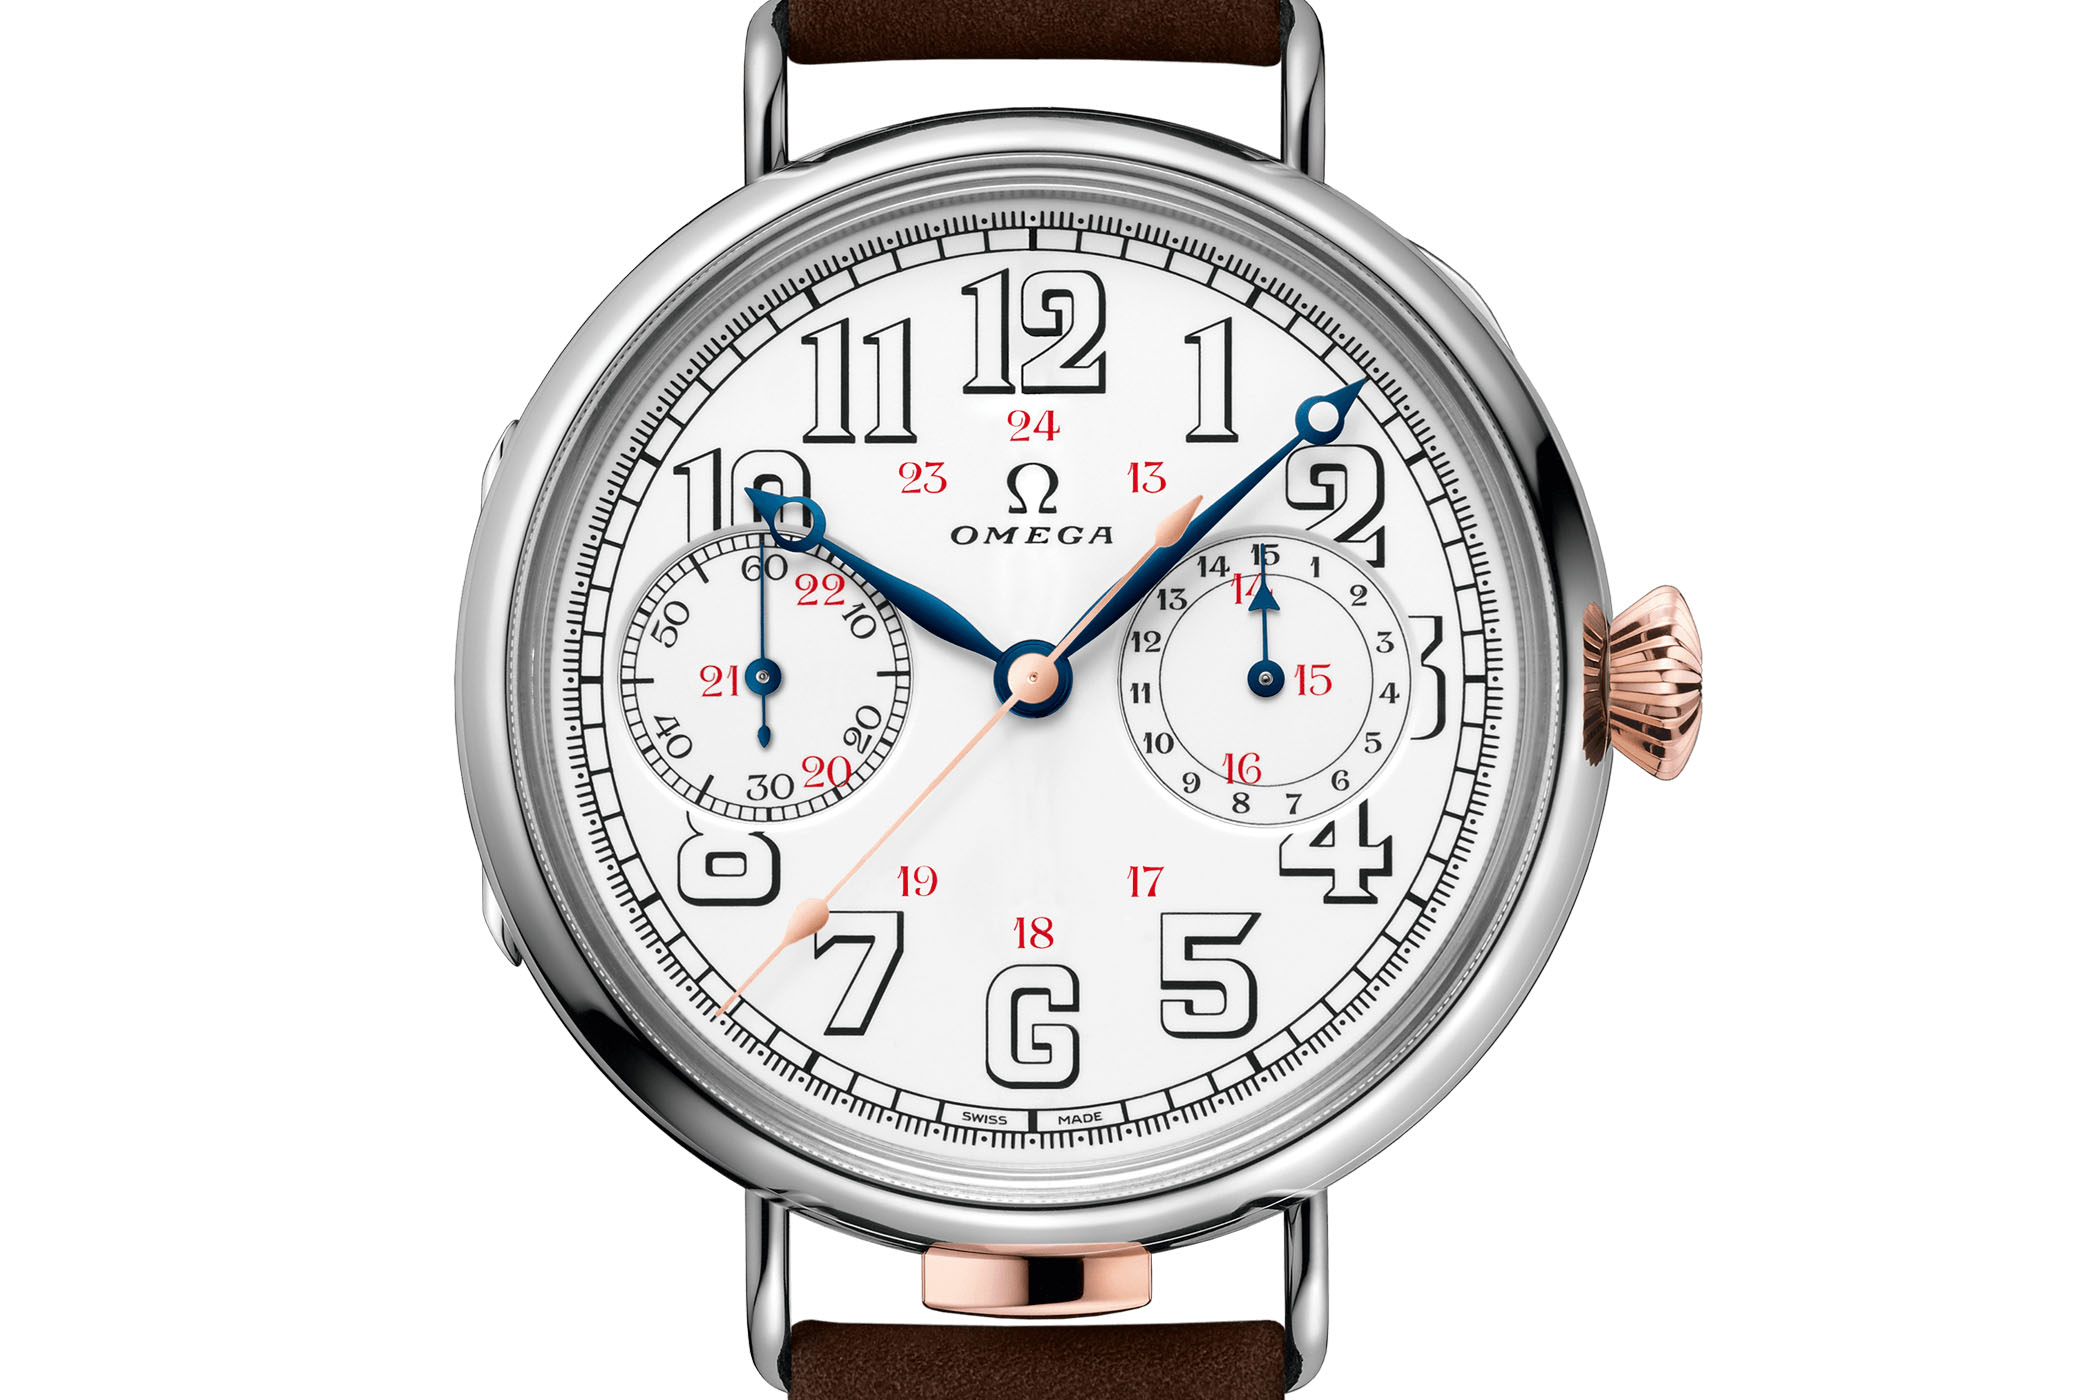 Omega First Wrist Chronograph reissue - 14